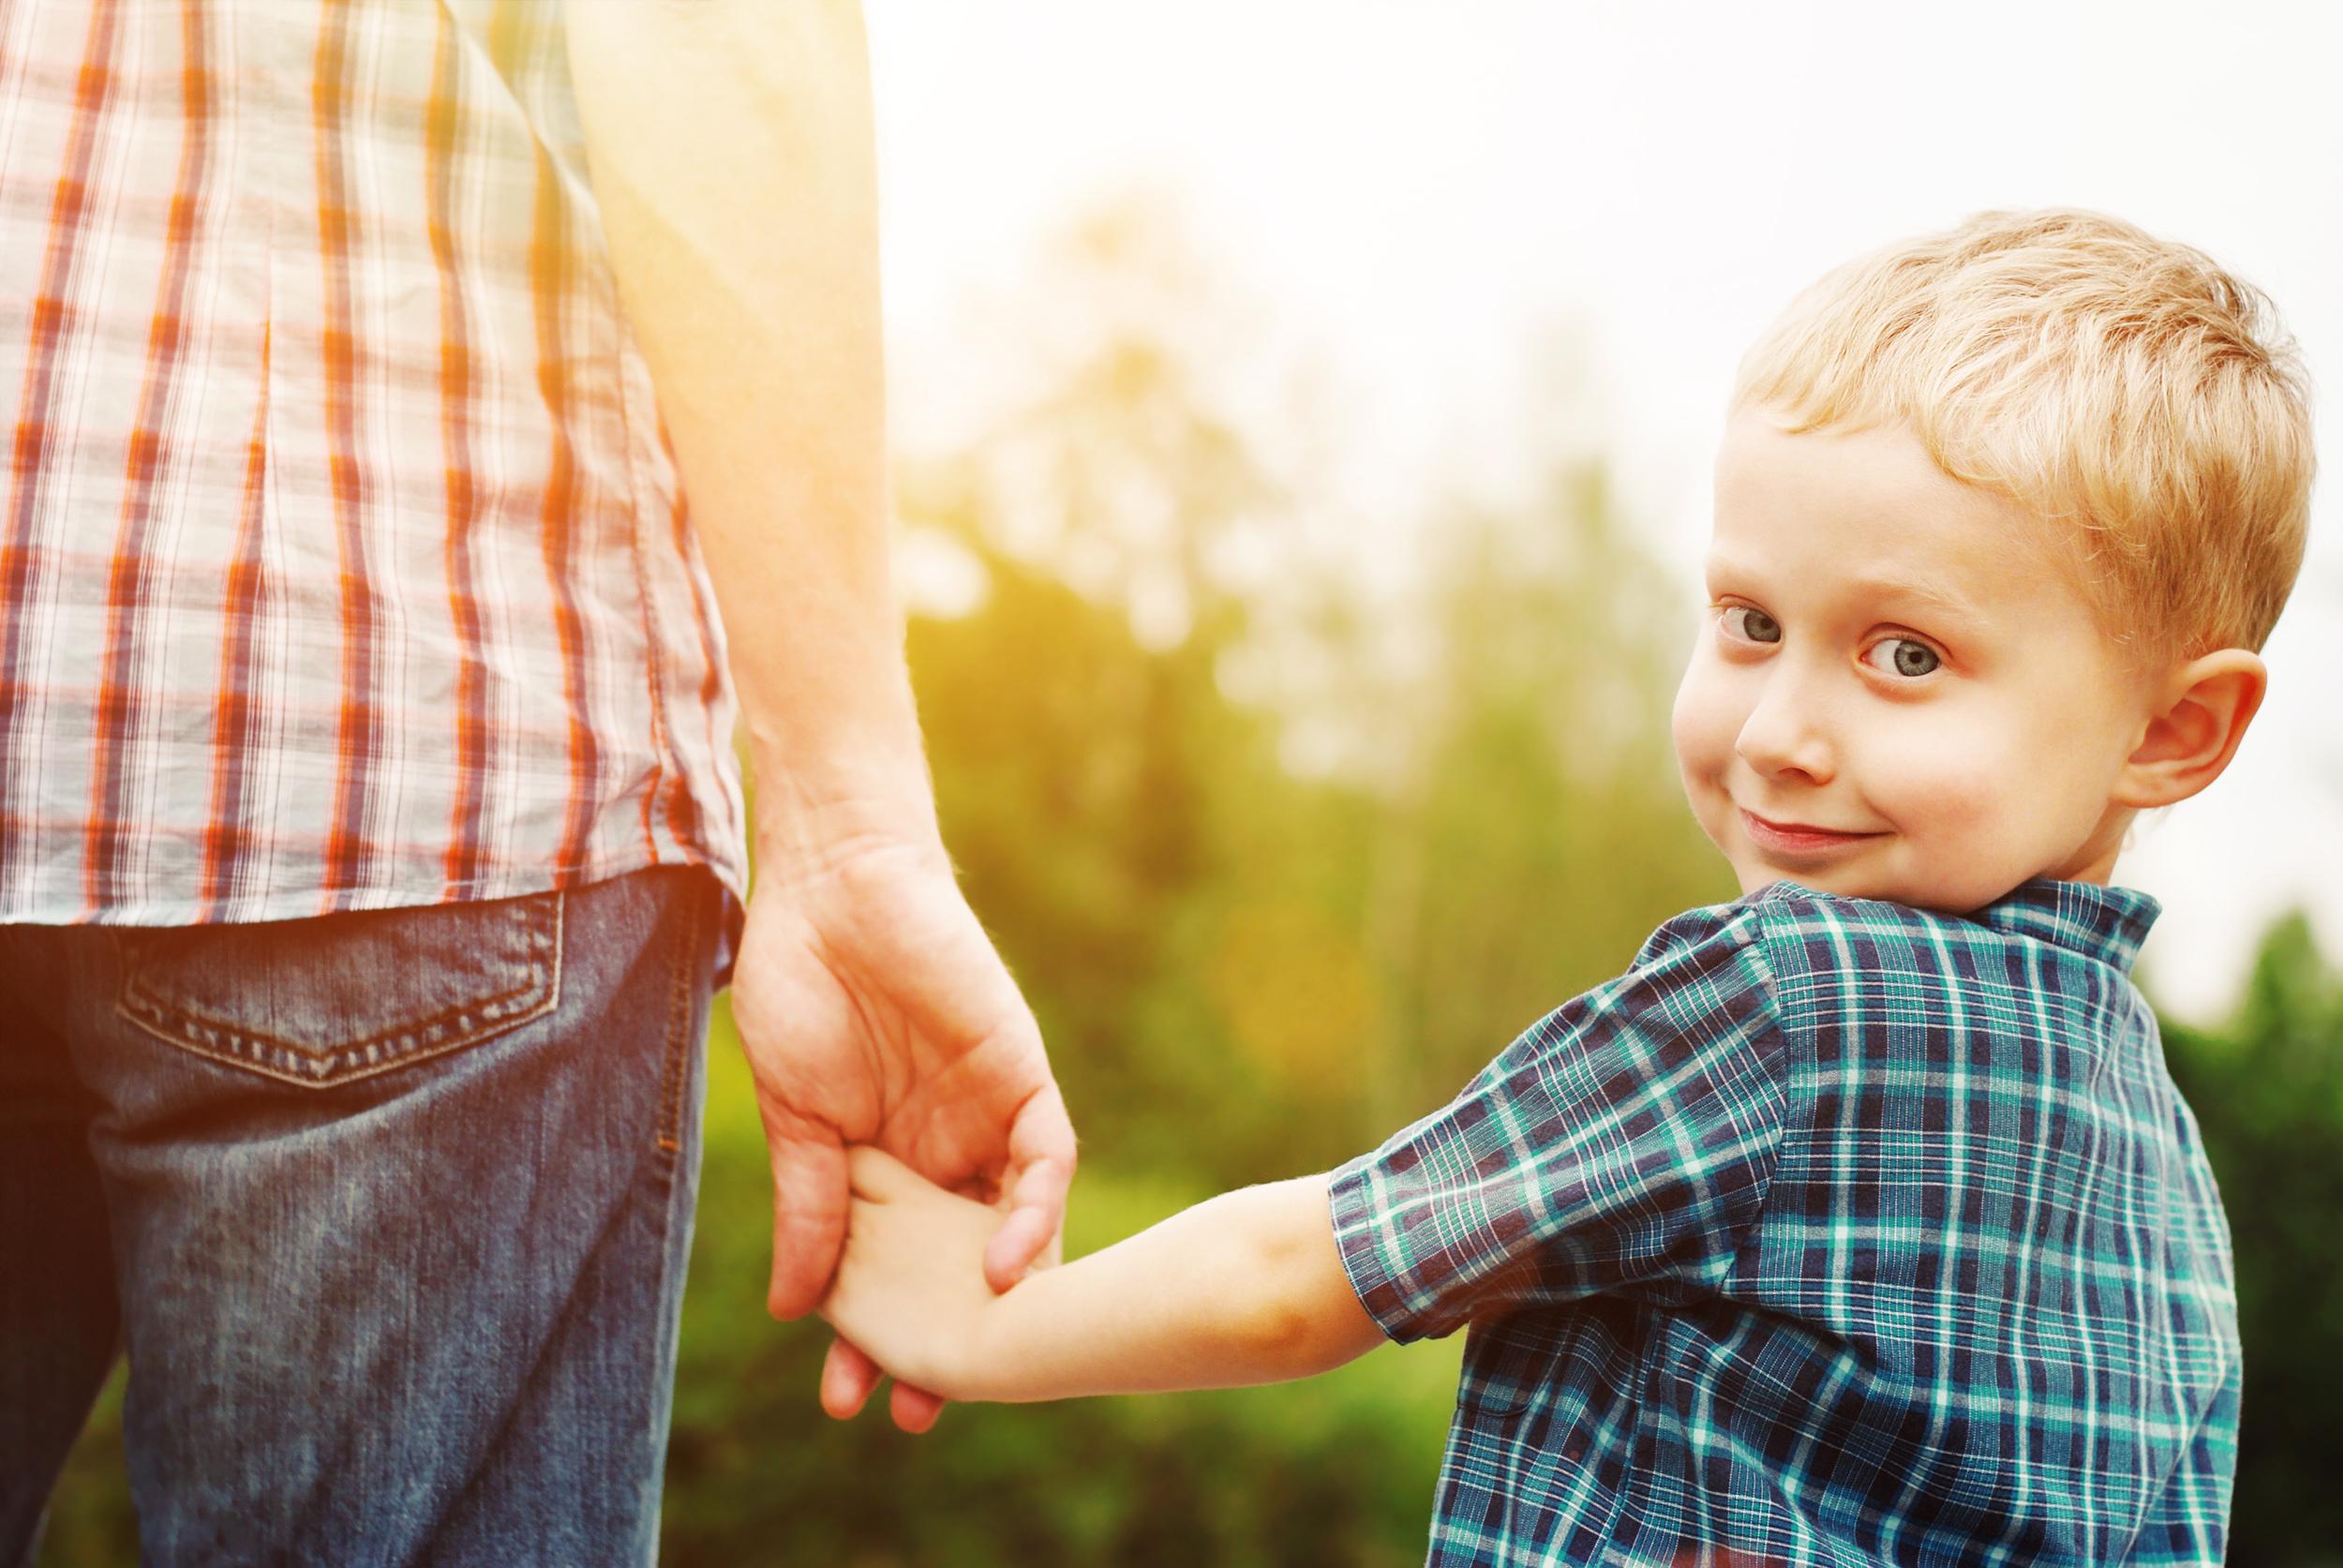 Happy child holding Dad's hand